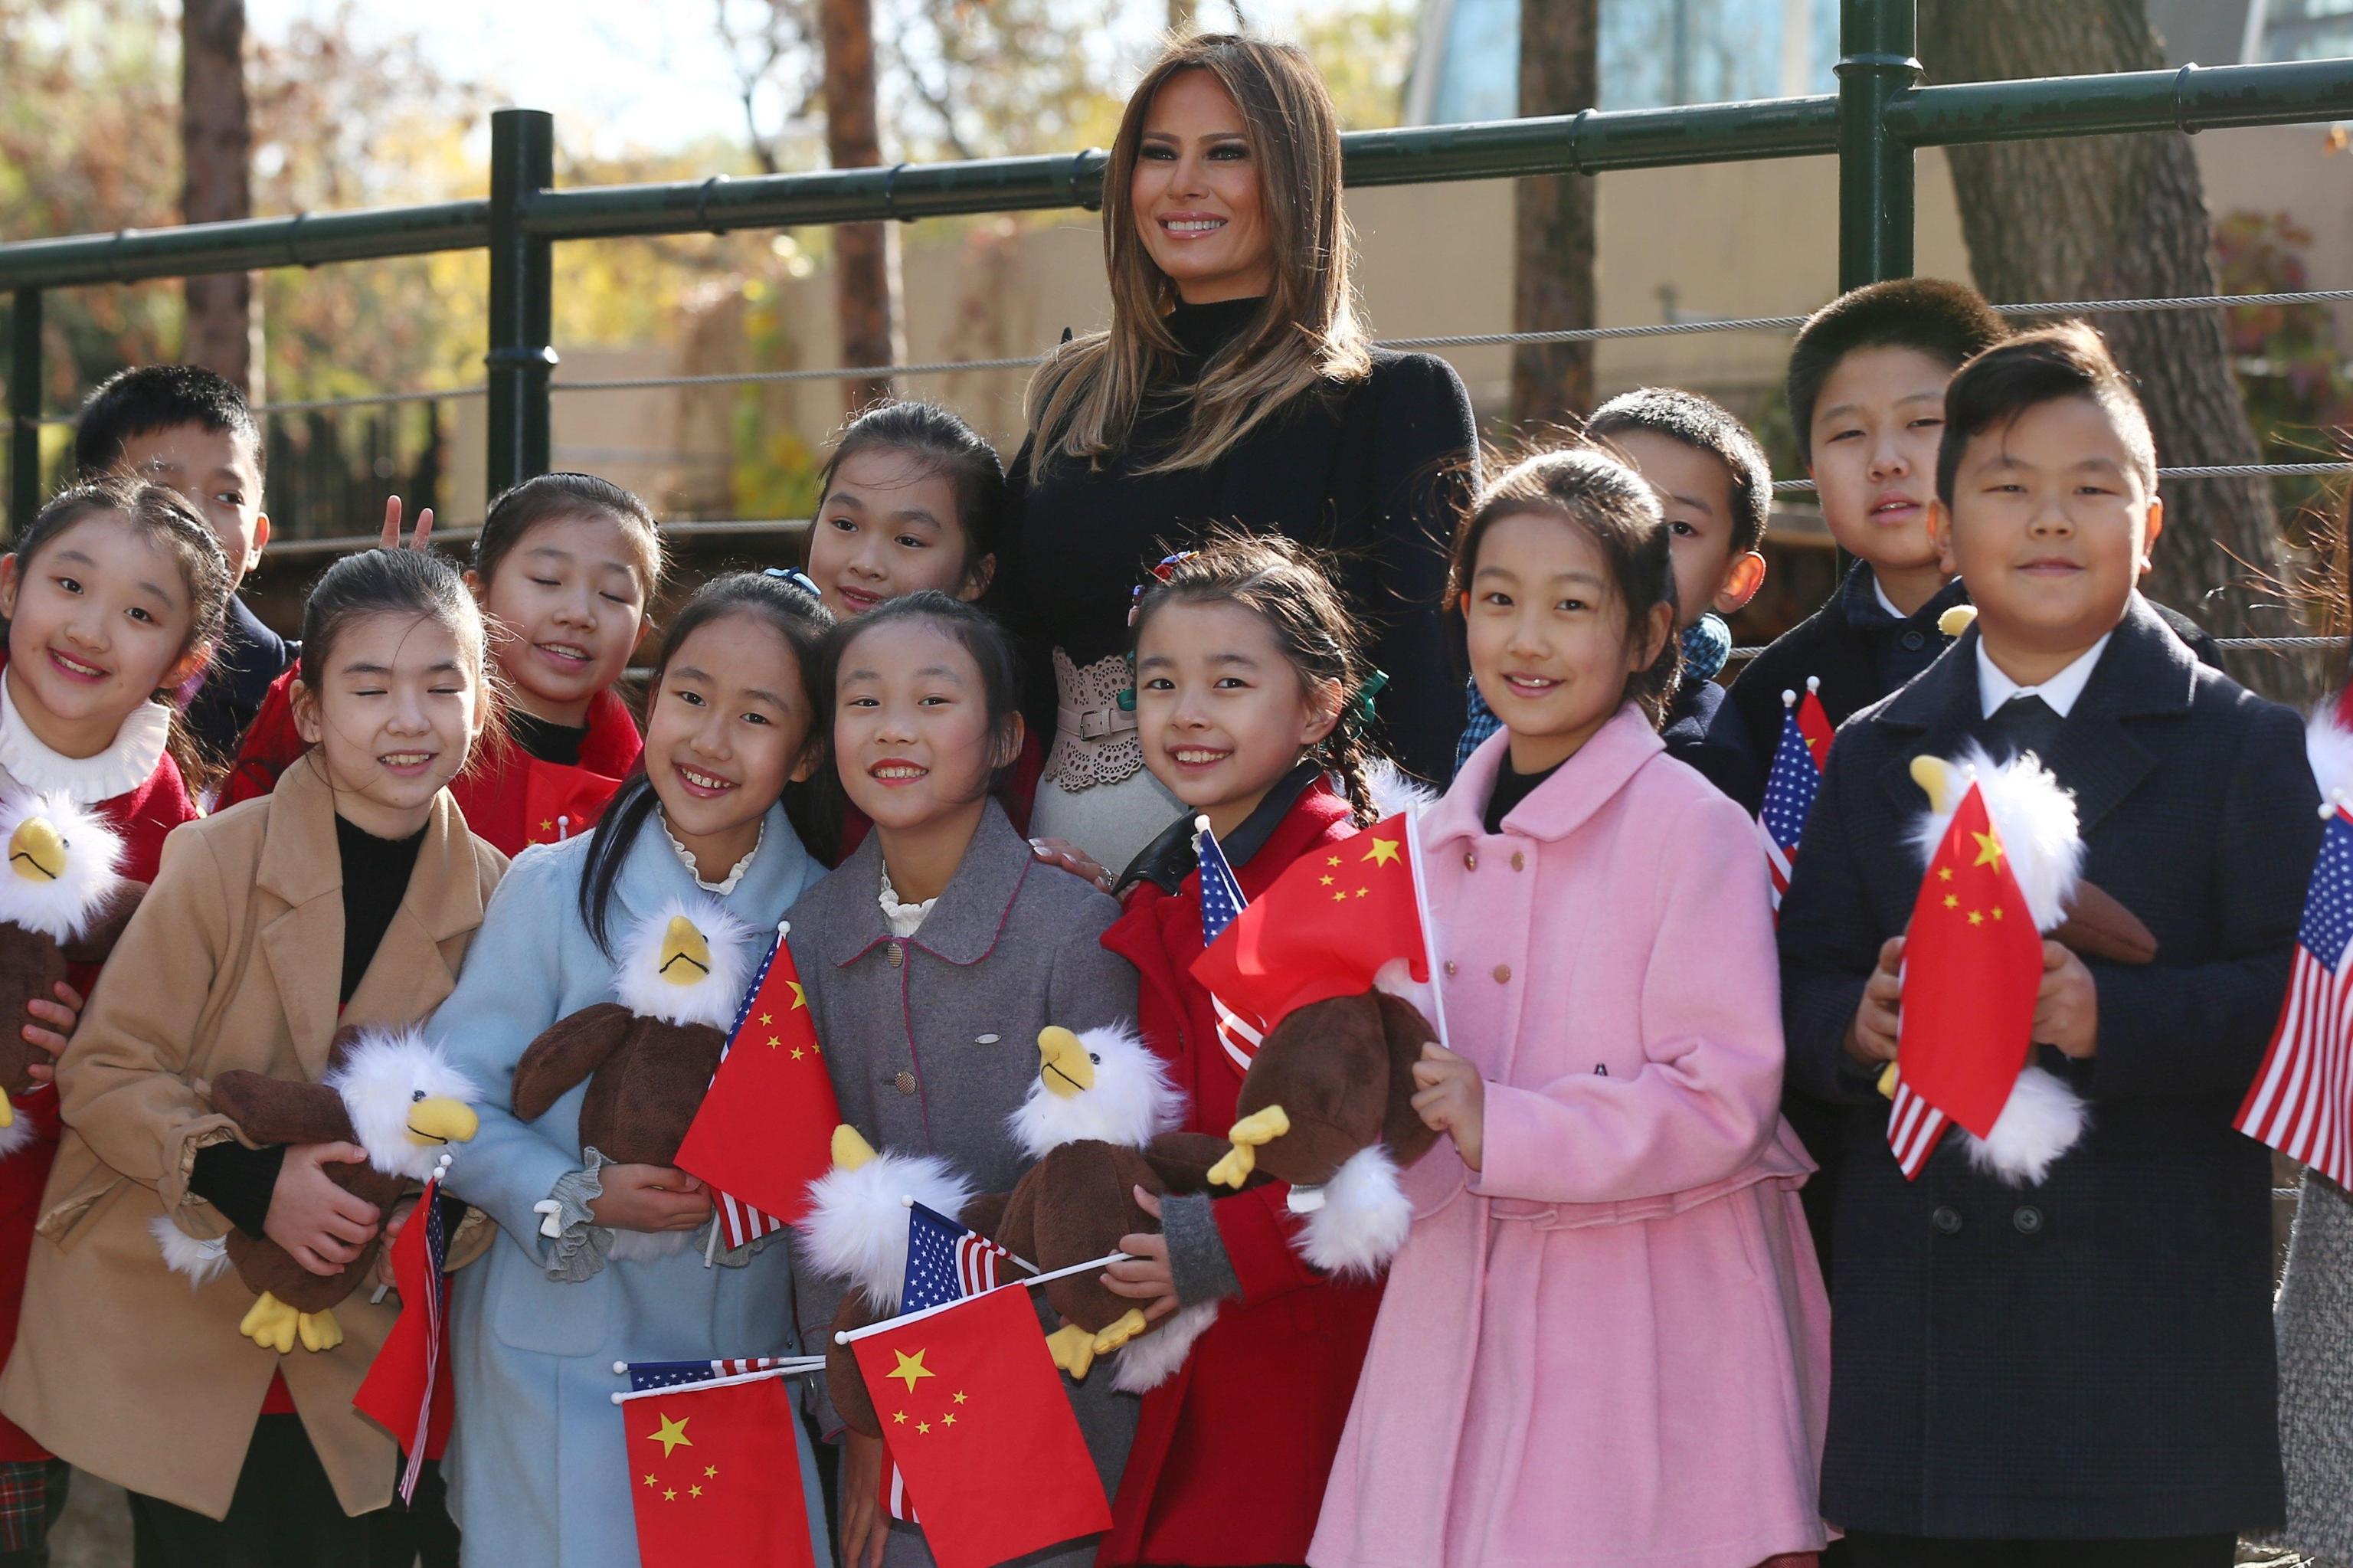 US President Donald J. Trump and First Lady Melania visit China